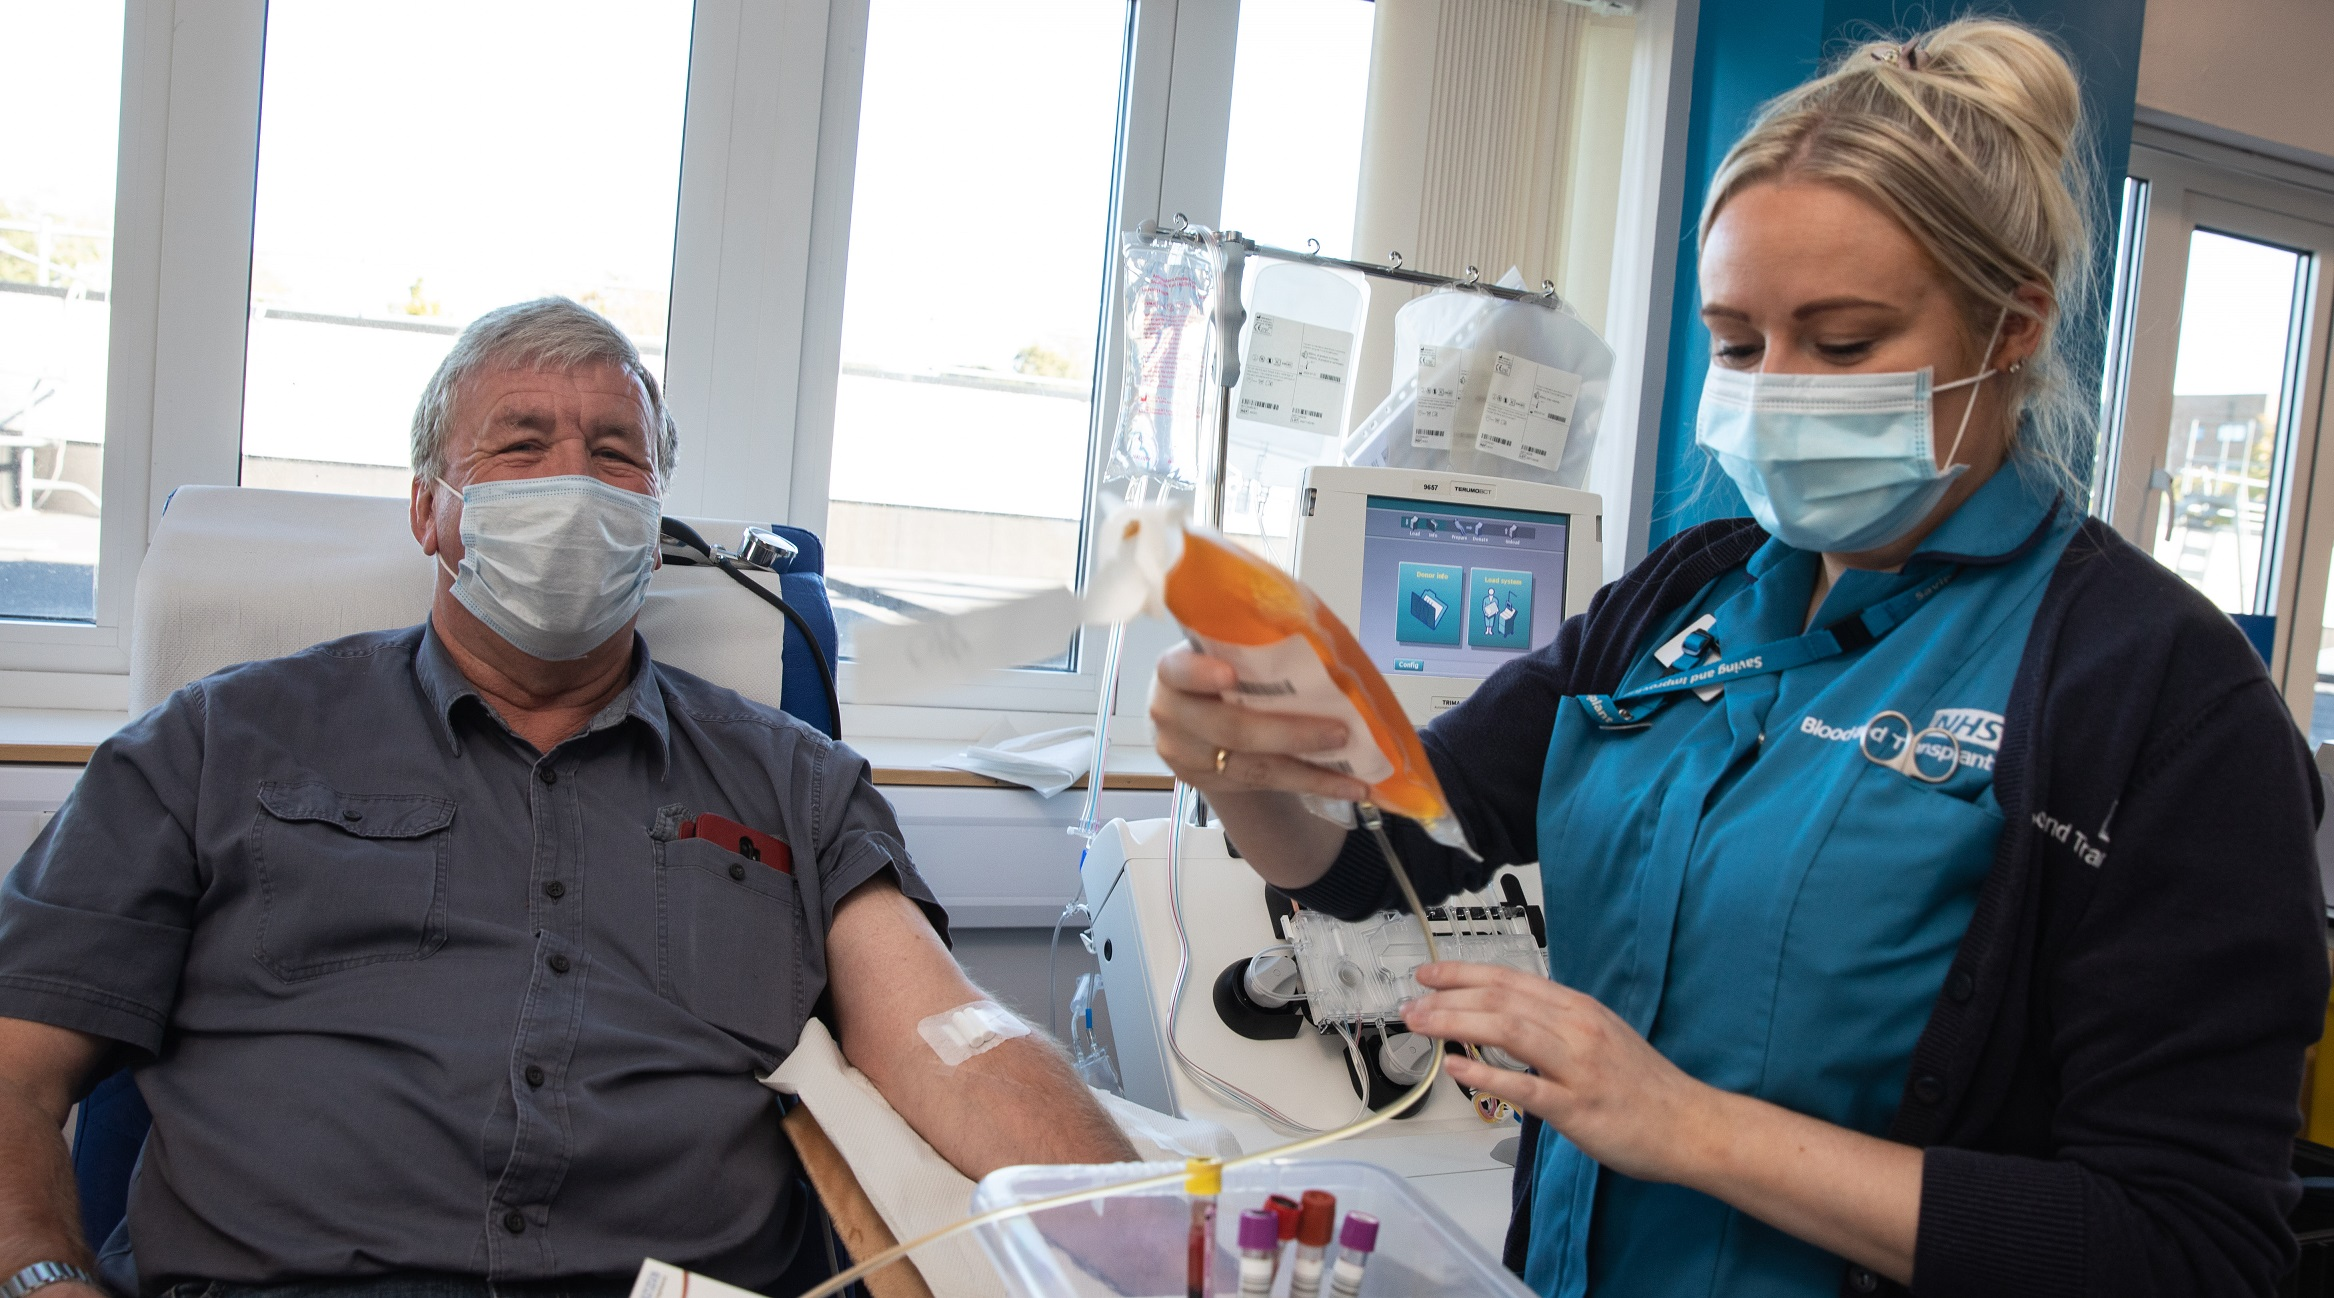 Alan Mack - donating plasma - and a donor carer